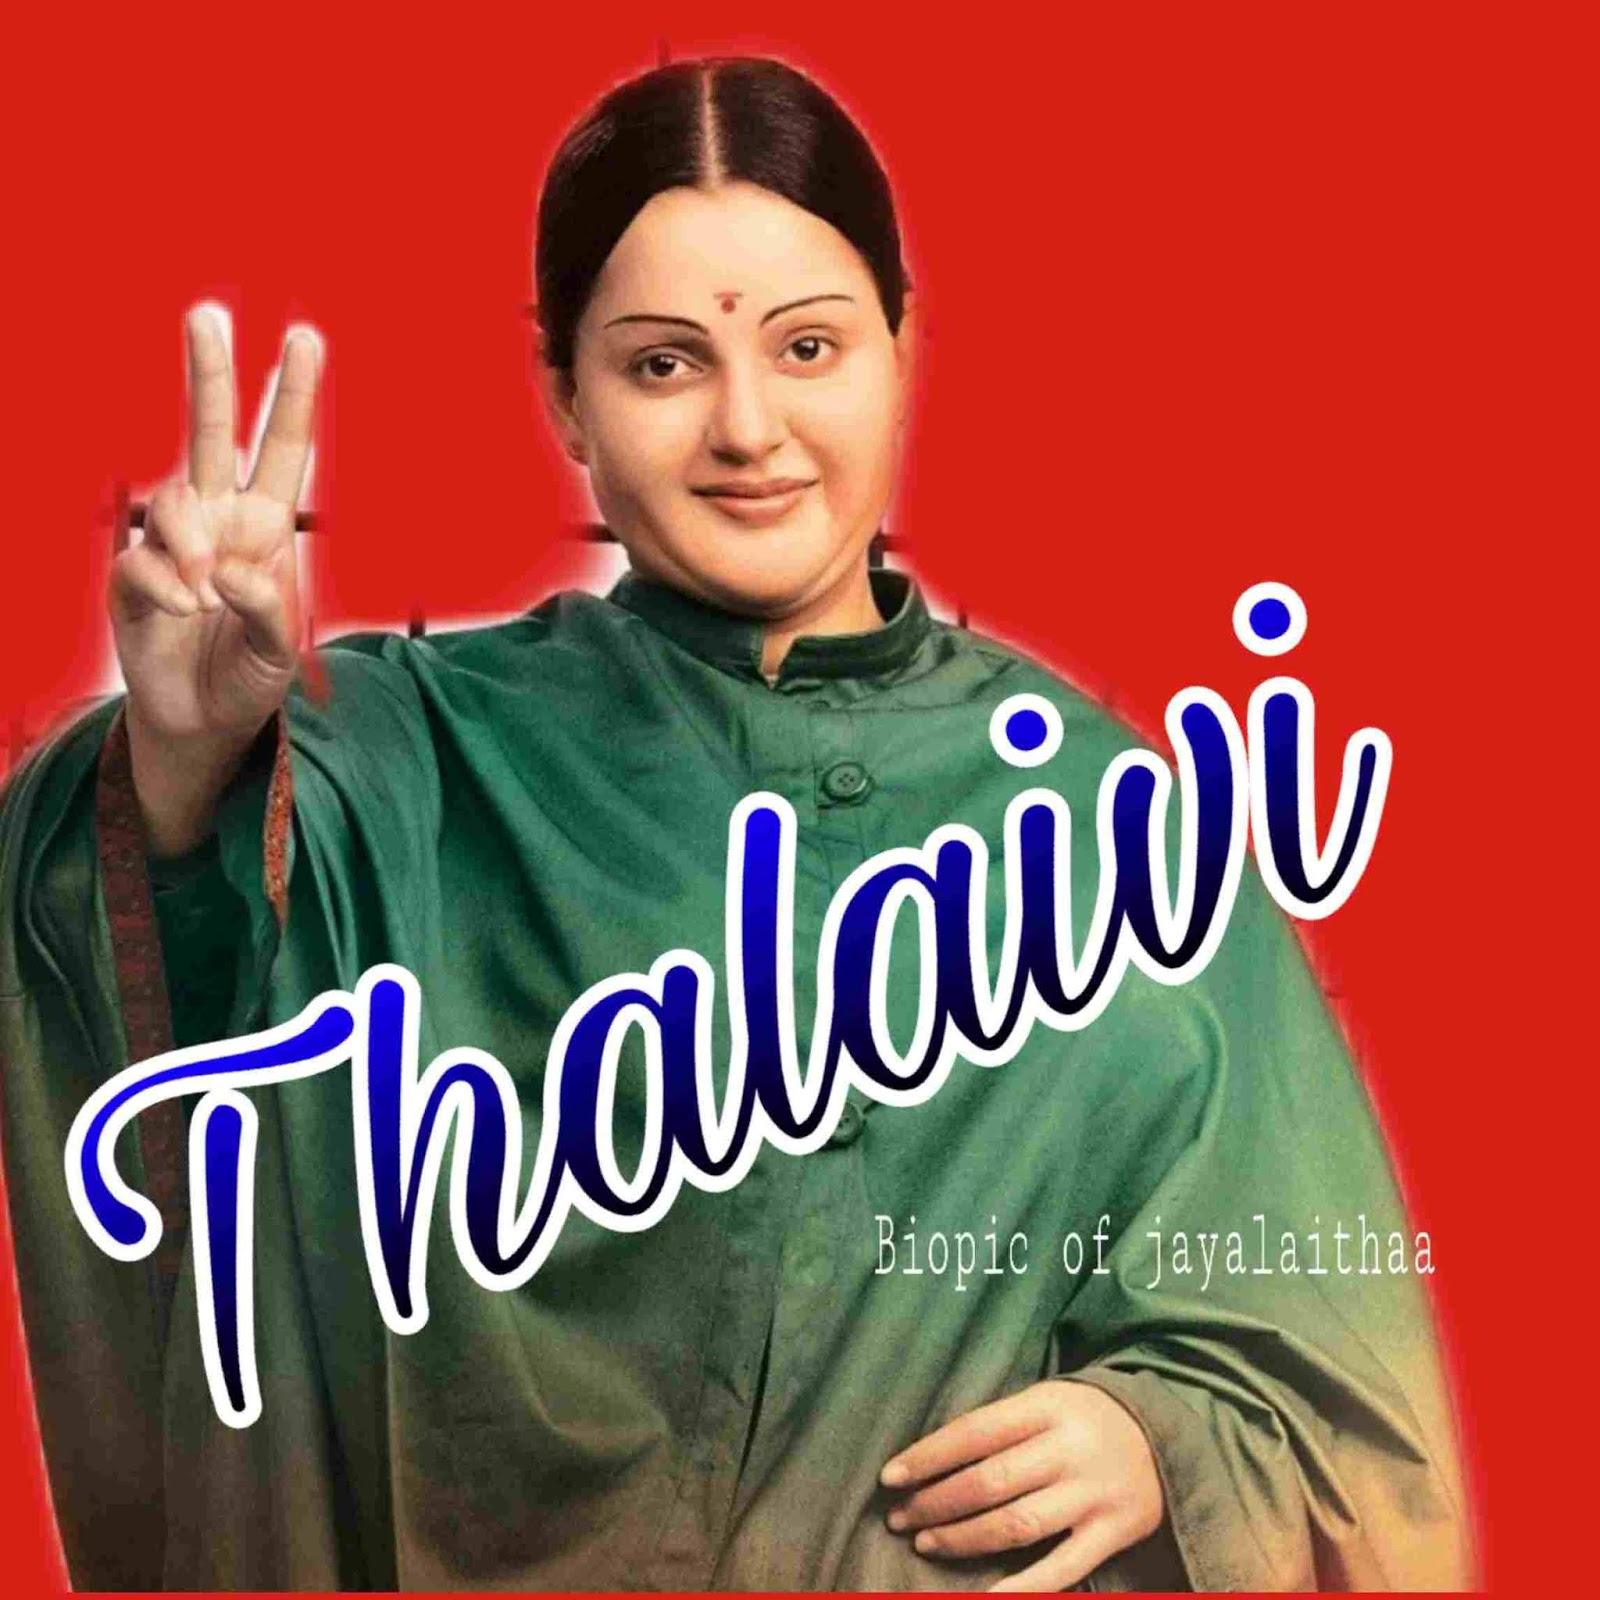 Thalaivi movie kangna ranaut trailer cast